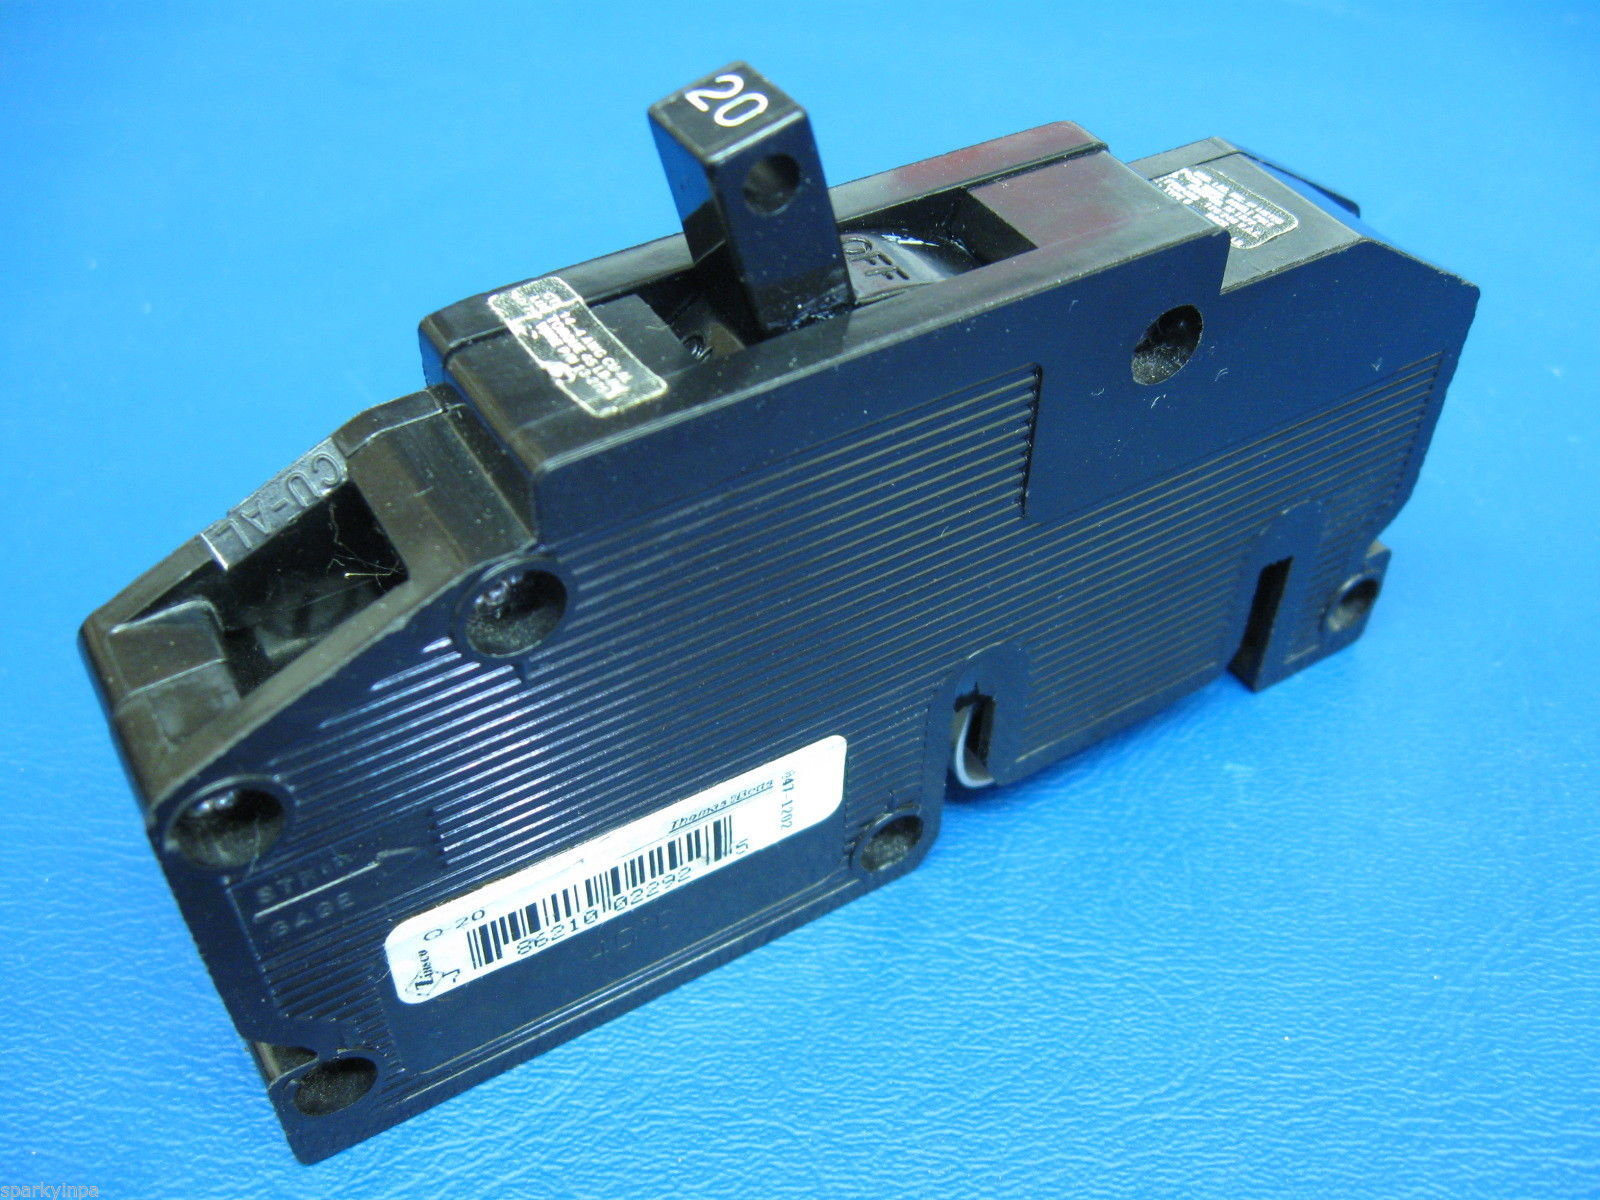 20a Zinsco Or Gte Sylvania 20 Amp 1 Pole Type Q Breaker